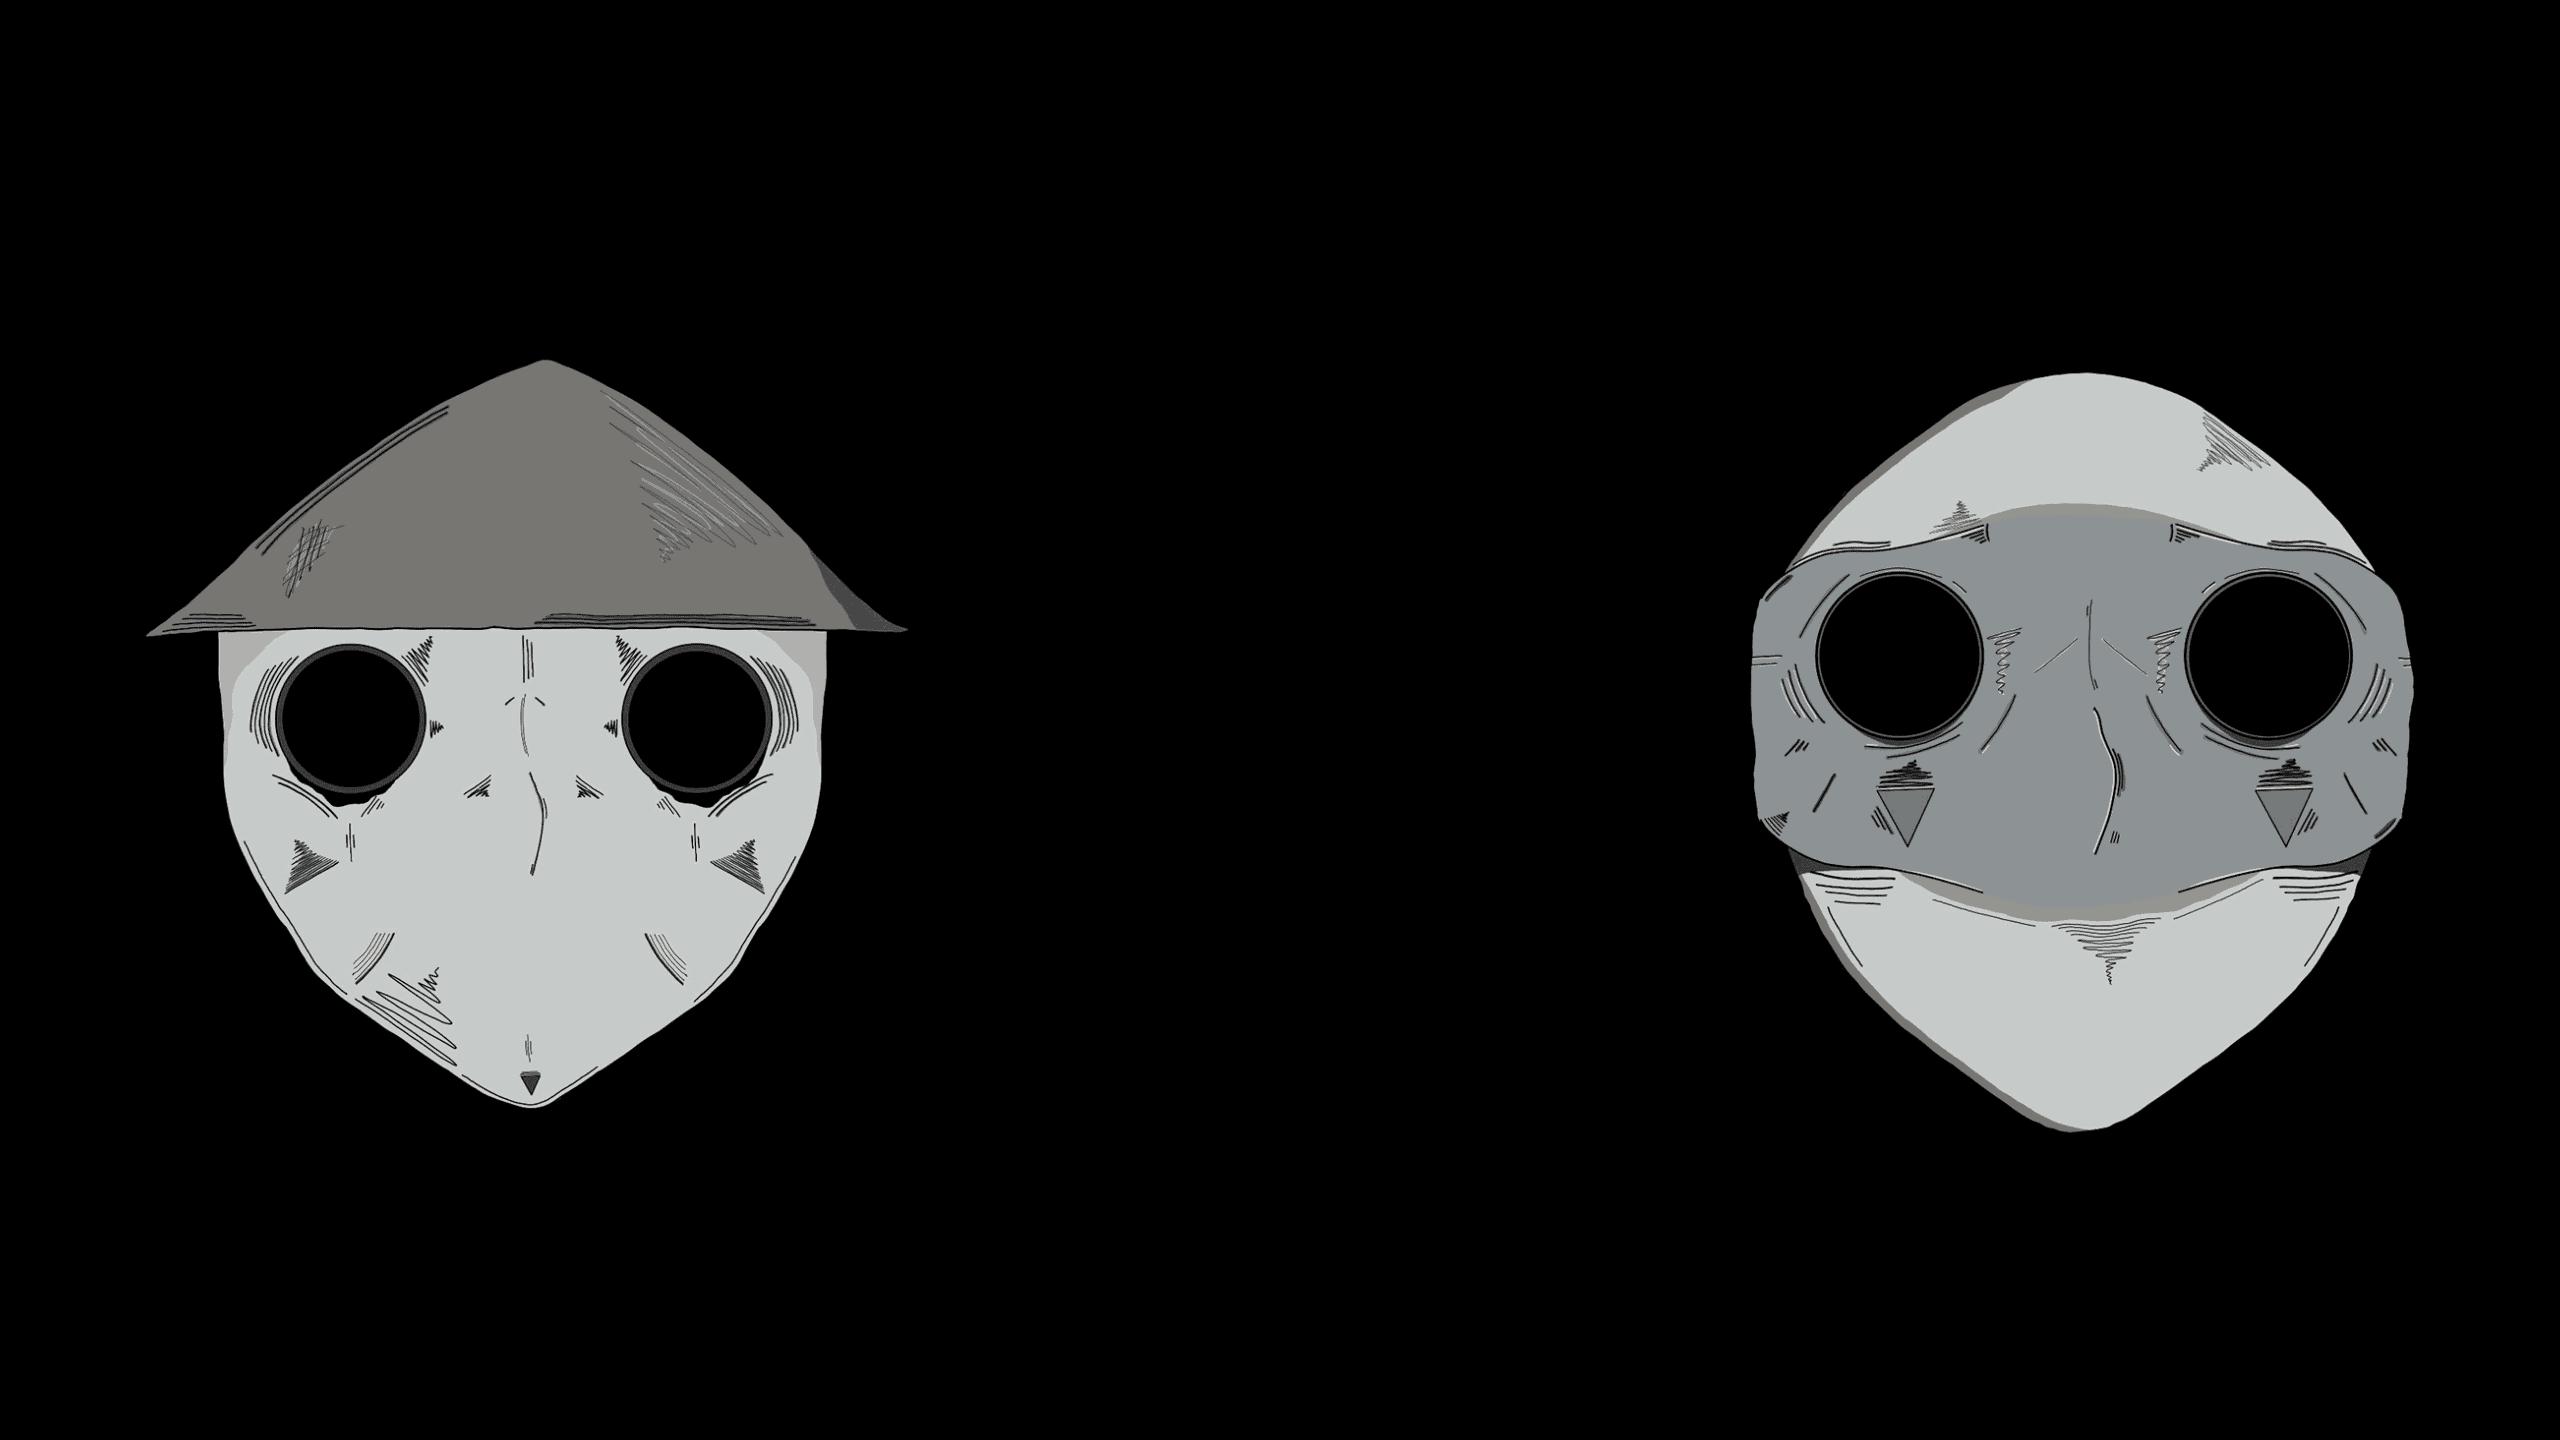 i saw a face